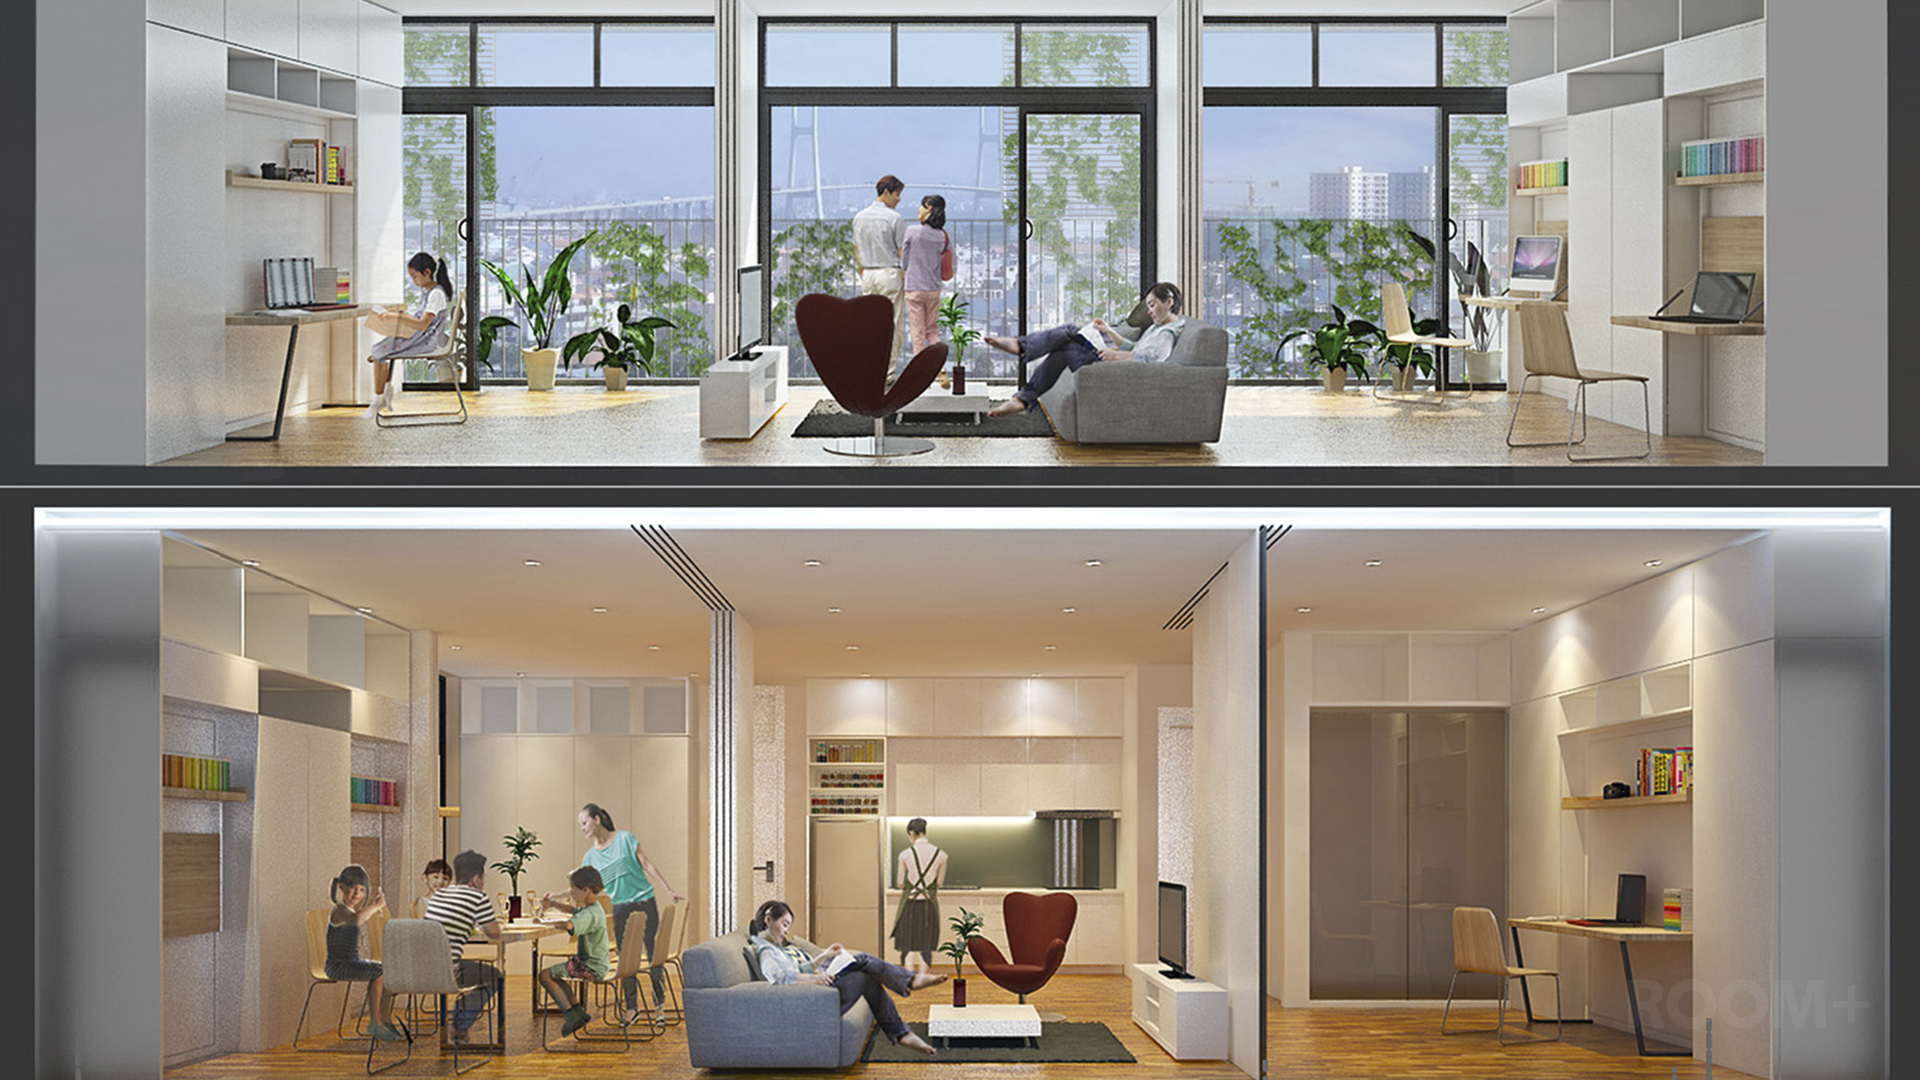 ROOM+ Thanh My Modular Housing (11)